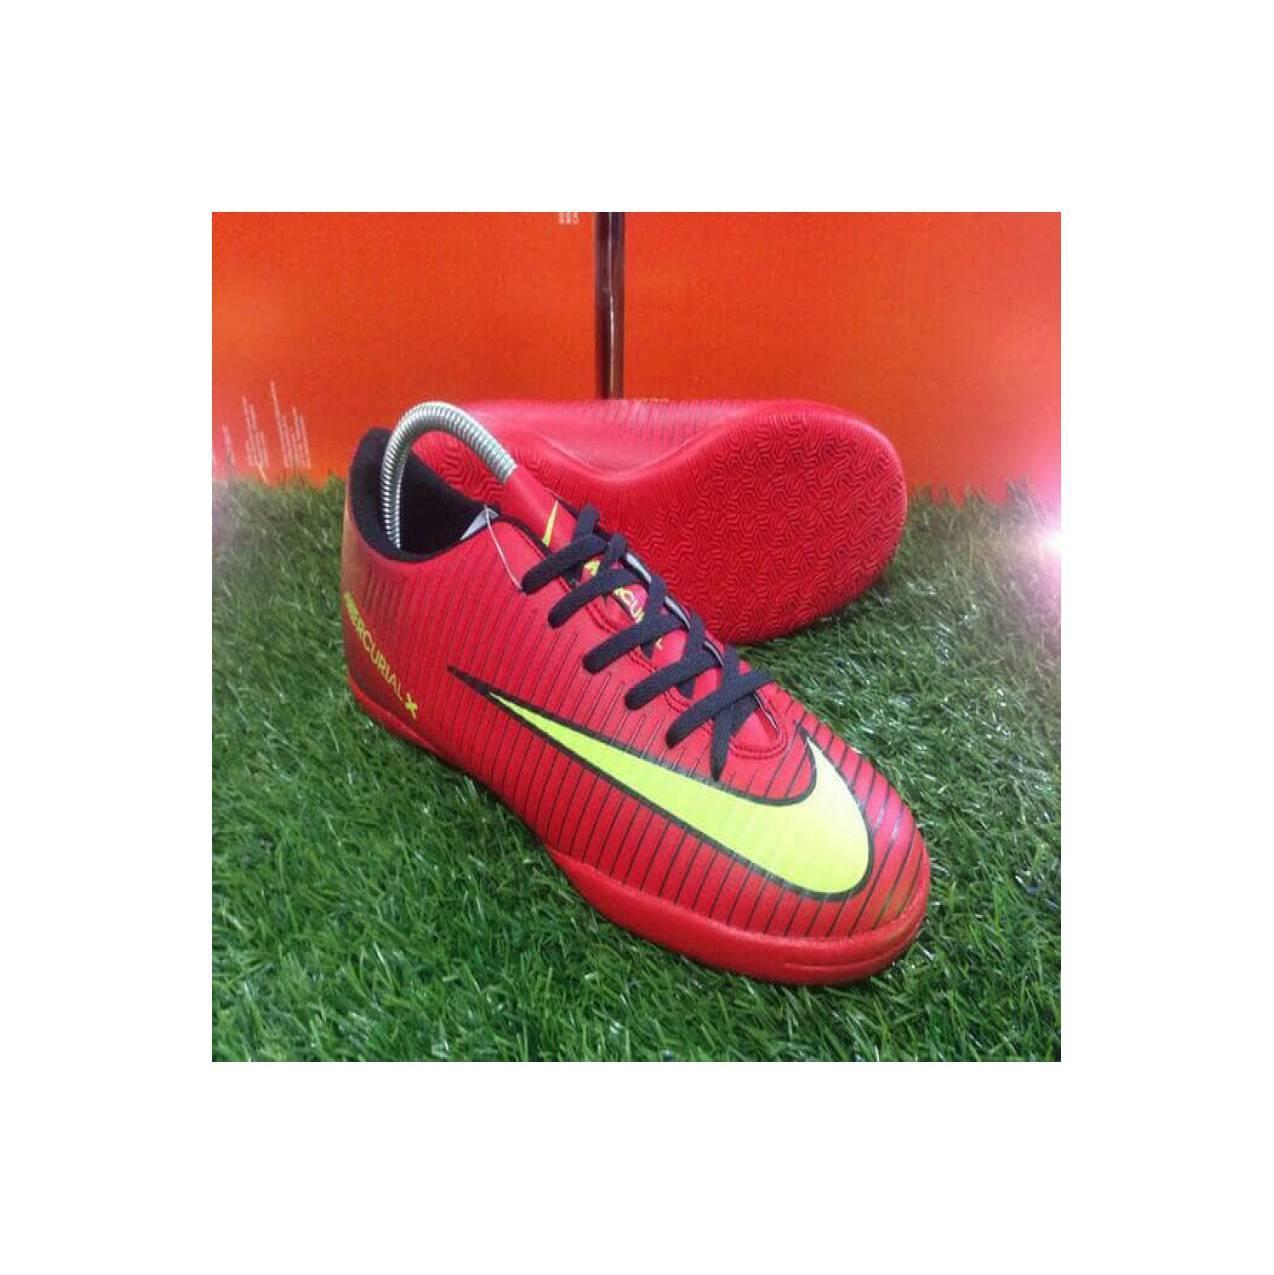 984e08b9f6cd7869d990173aa489bac9 Koleksi Daftar Harga Sepatu Nike Zoom Ori Terlaris tahun ini